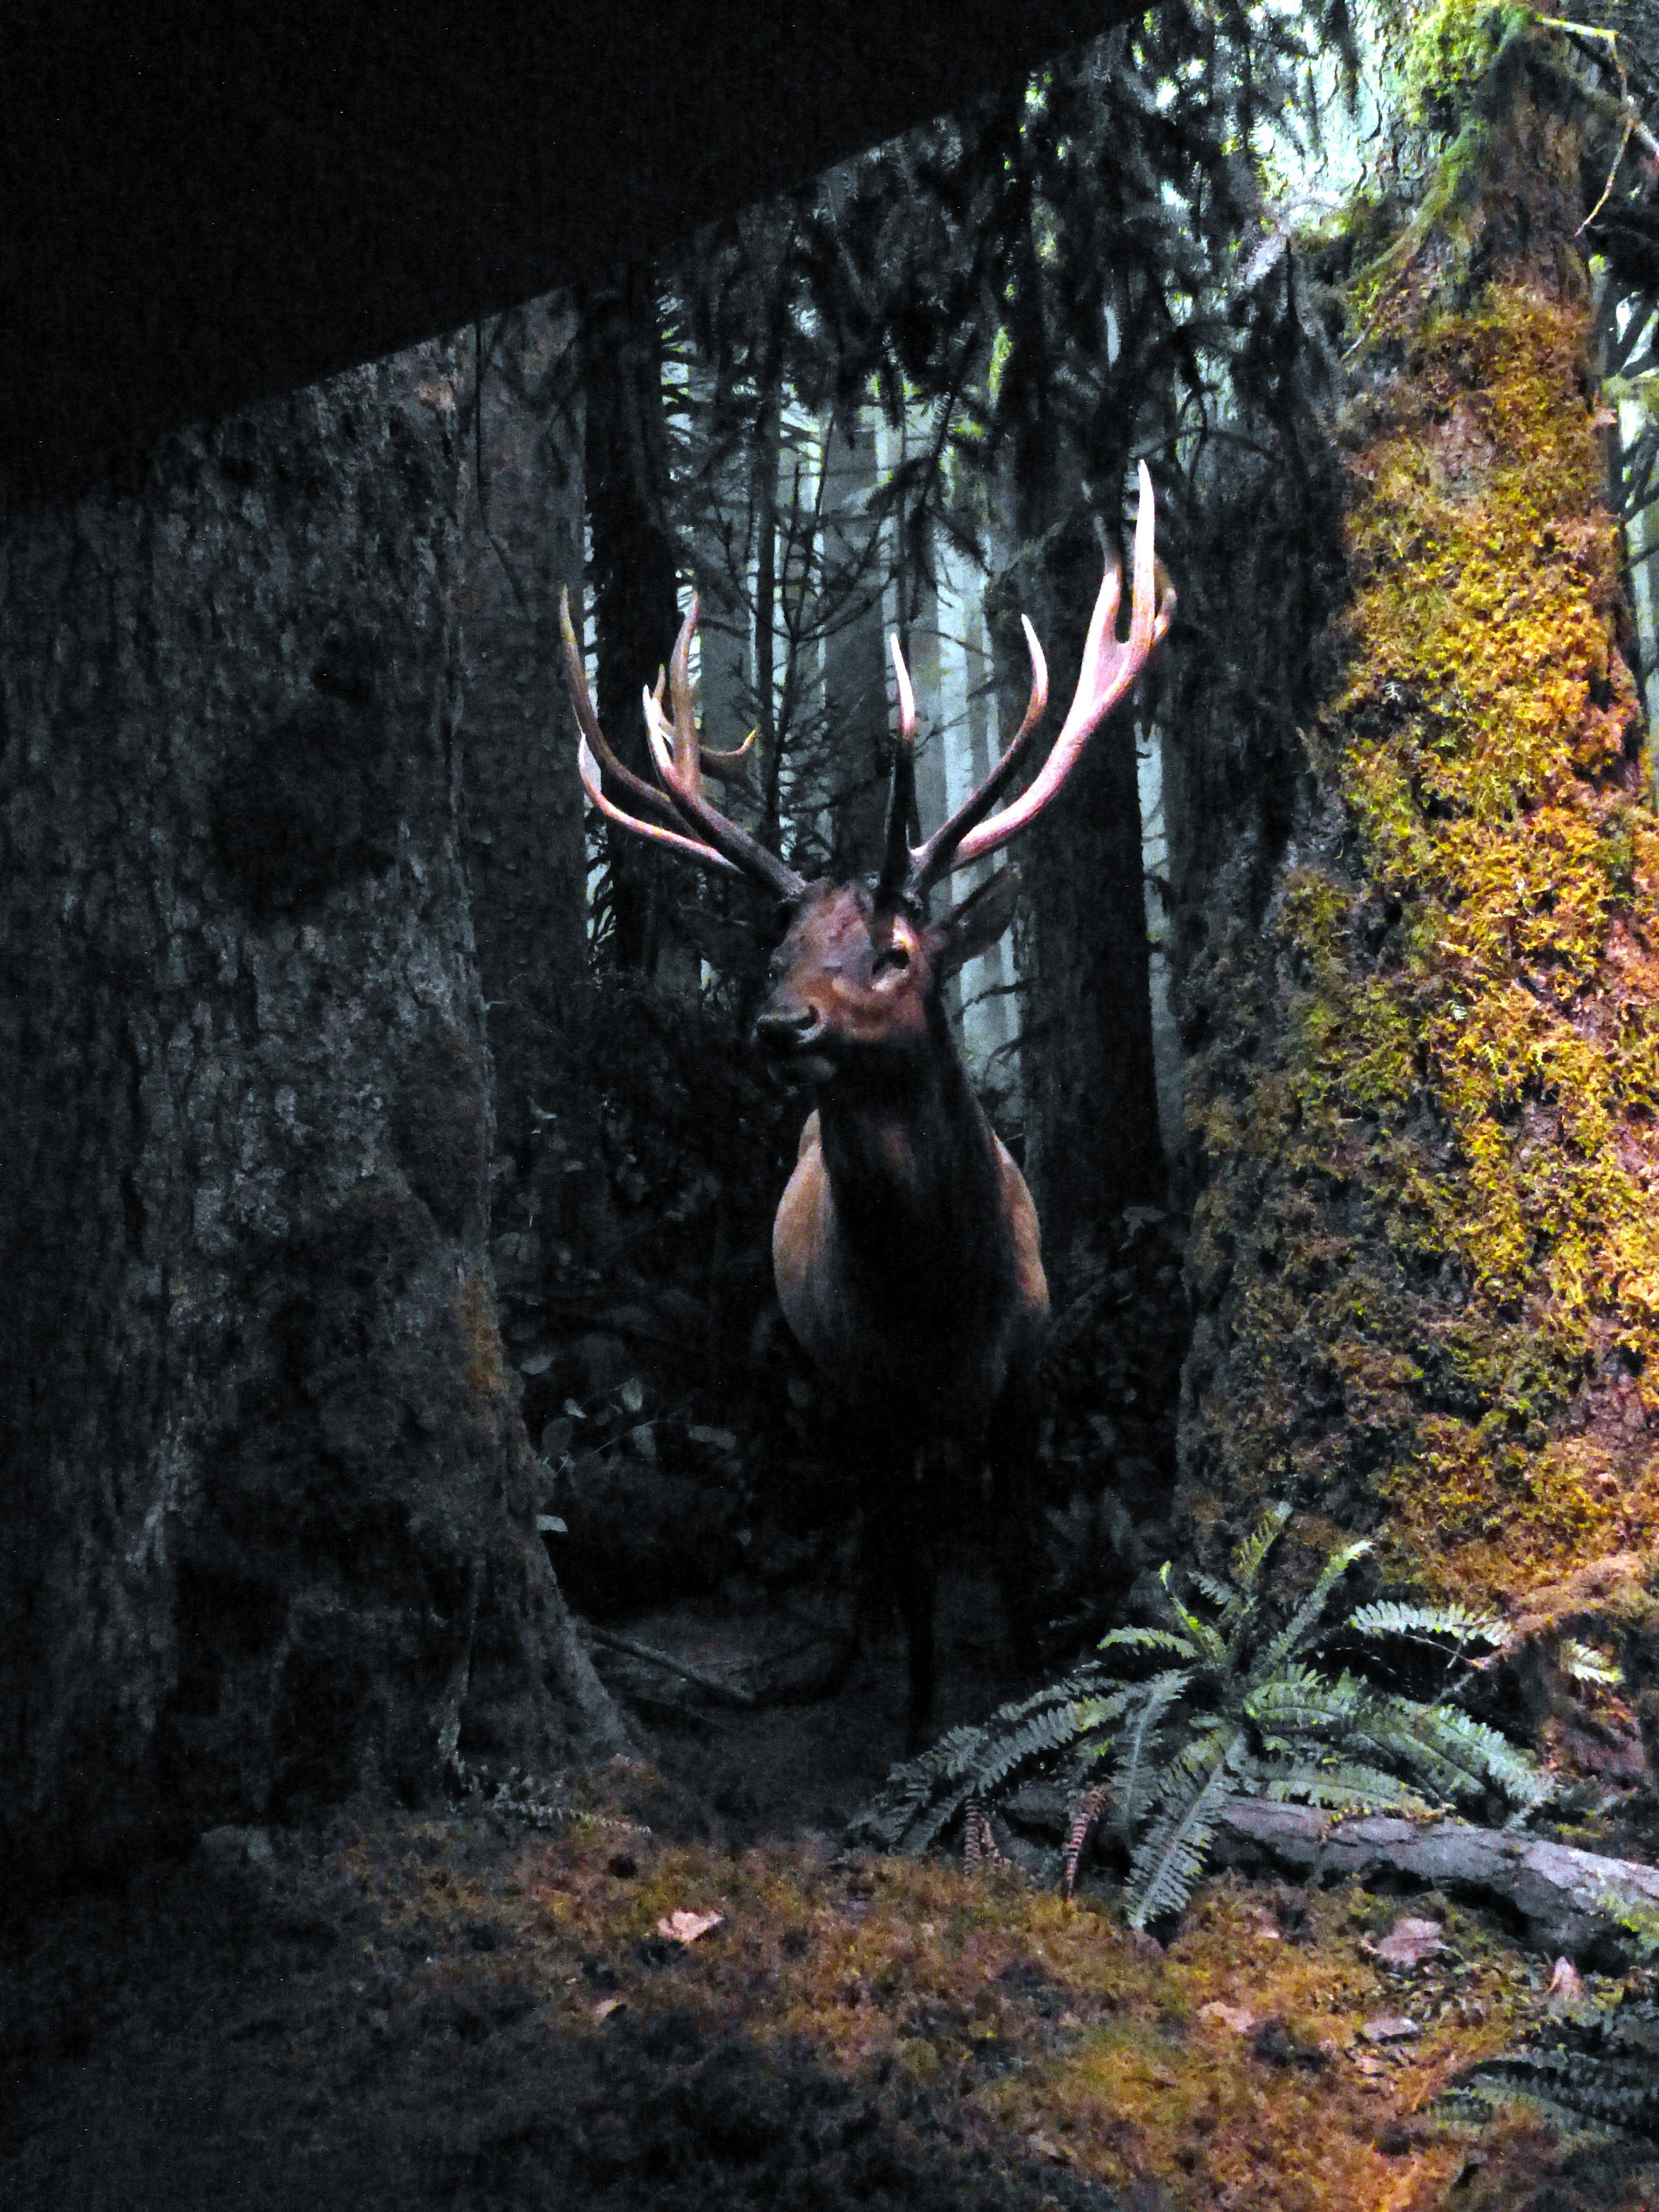 File:RBCM - Diorama Rainforest 2 Roosevelt Wapiti jpg